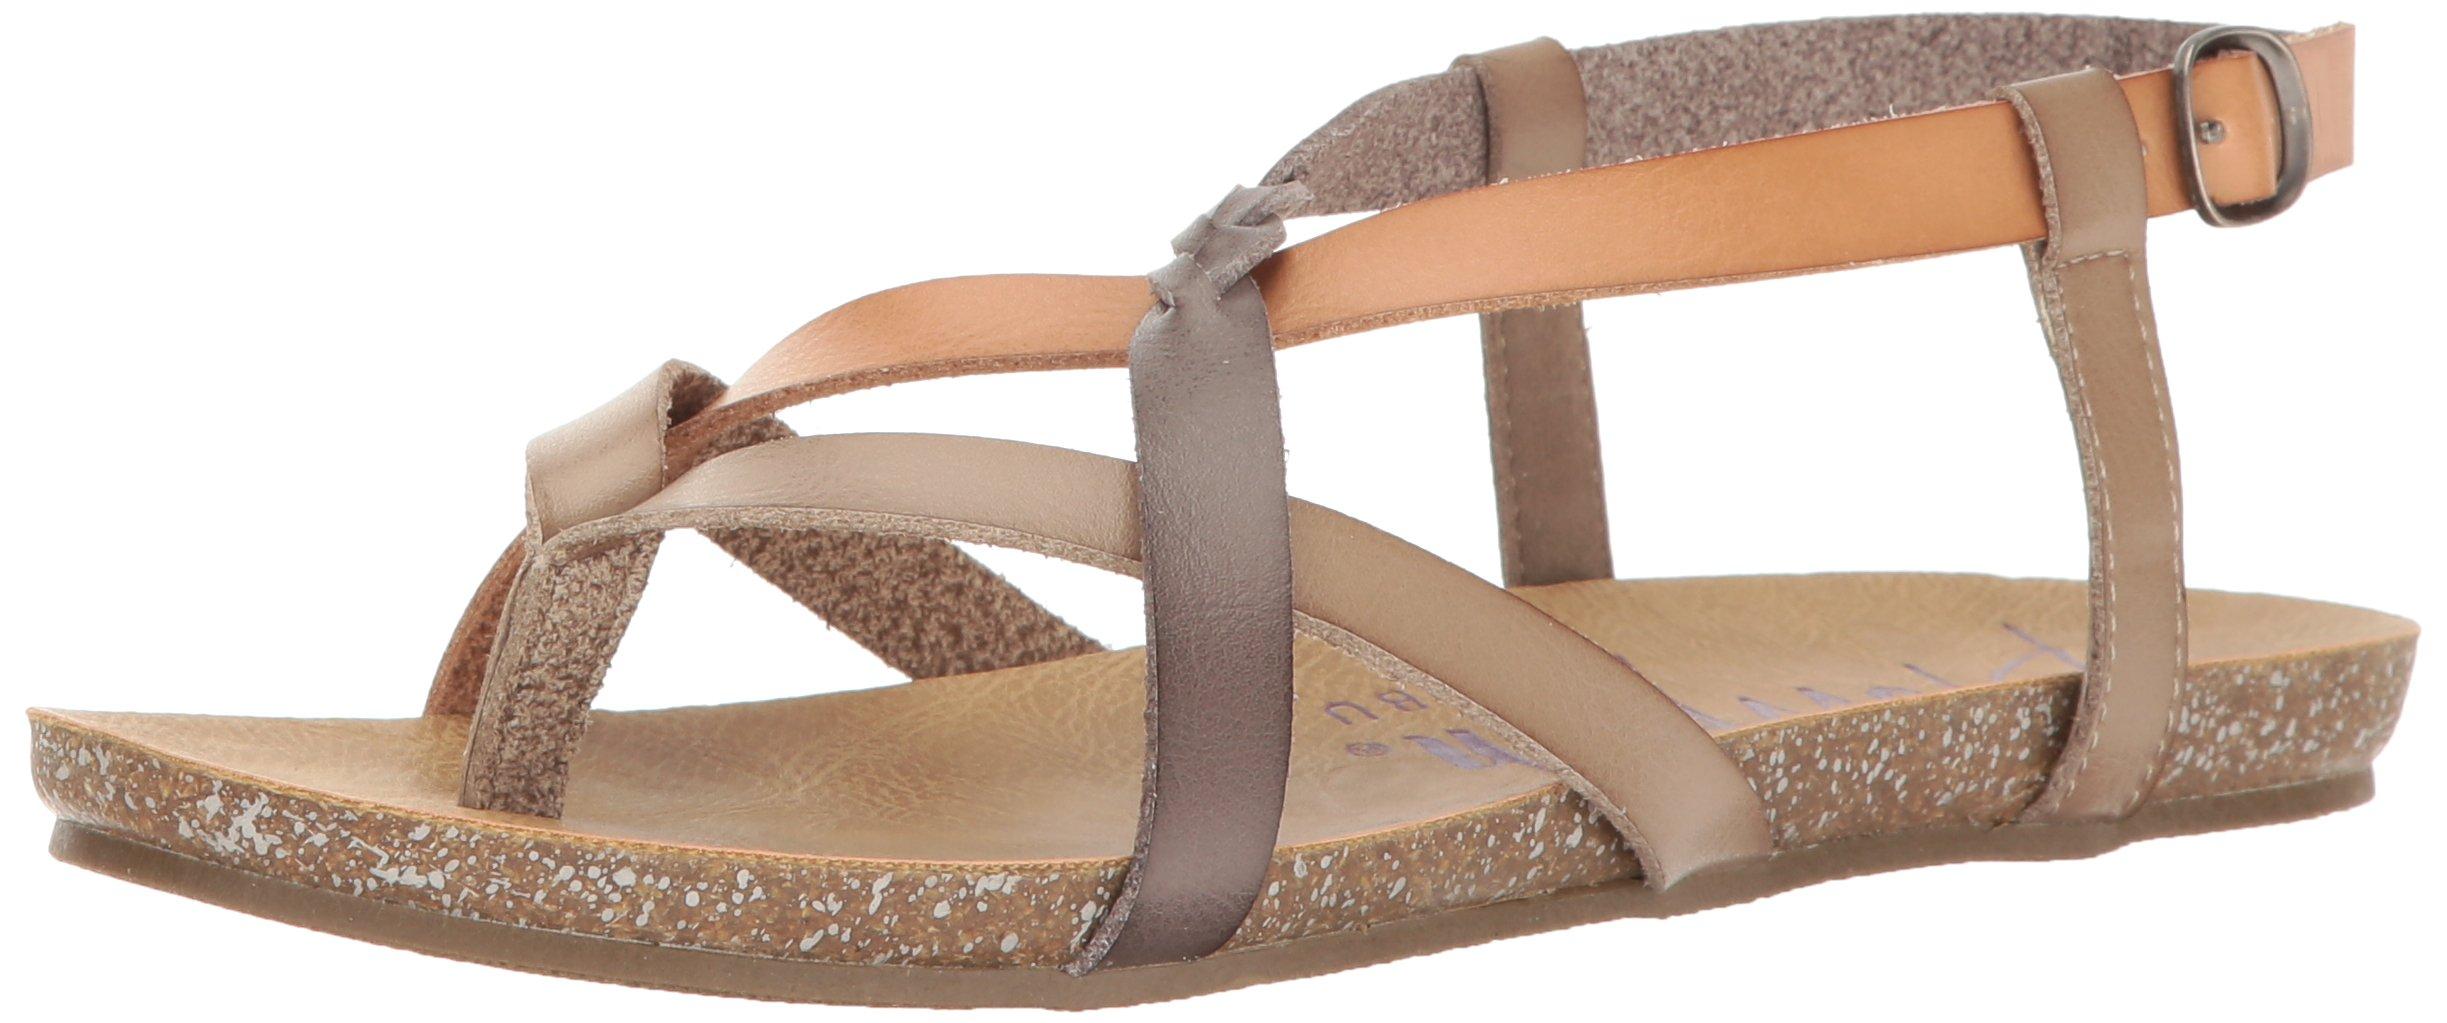 Blowfish Women's Granola-B Flat Sandal, Birch Nude Steel Grey Dyecut, 8 M US